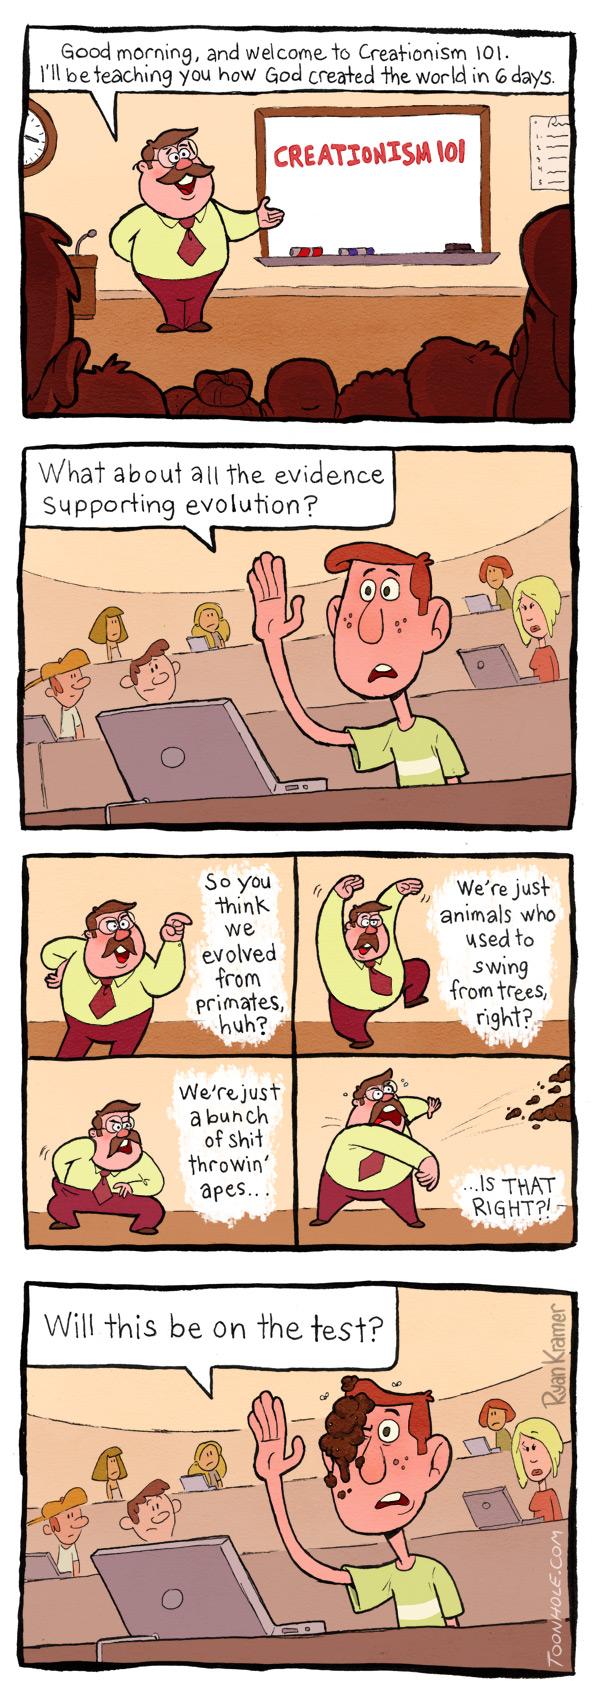 Creationism 101